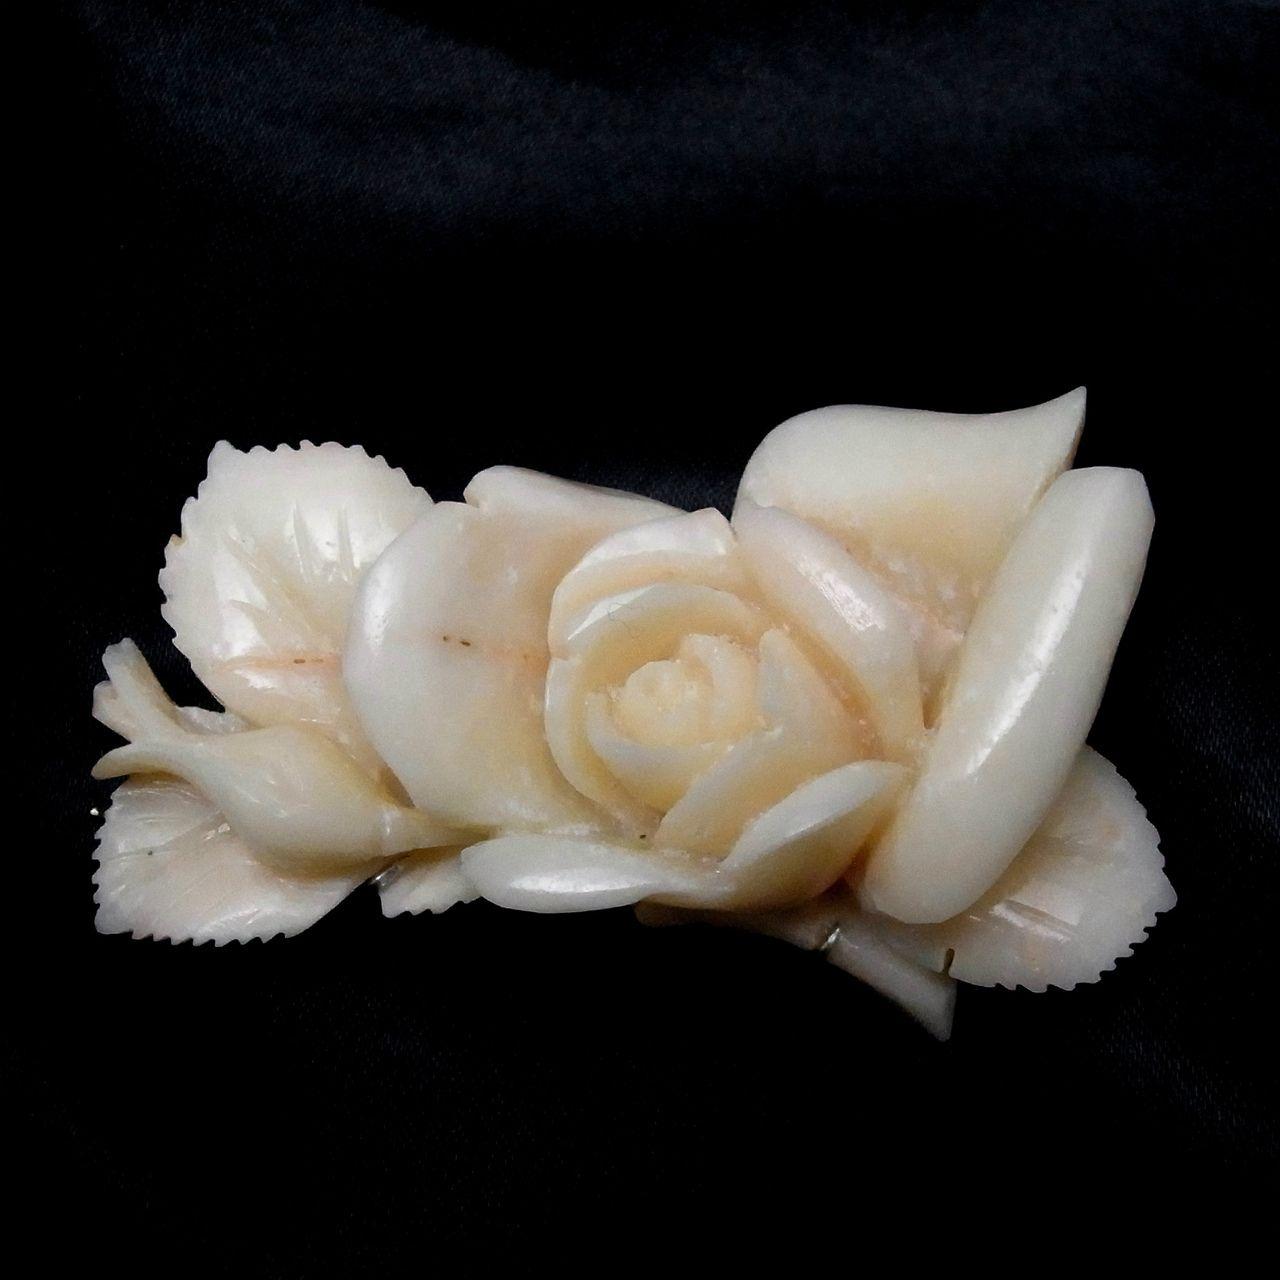 OBIDOME Modern Japanese carved coral Sash Clip for Kimono - Silver Mark #1806 - antique shop CHANO-YU